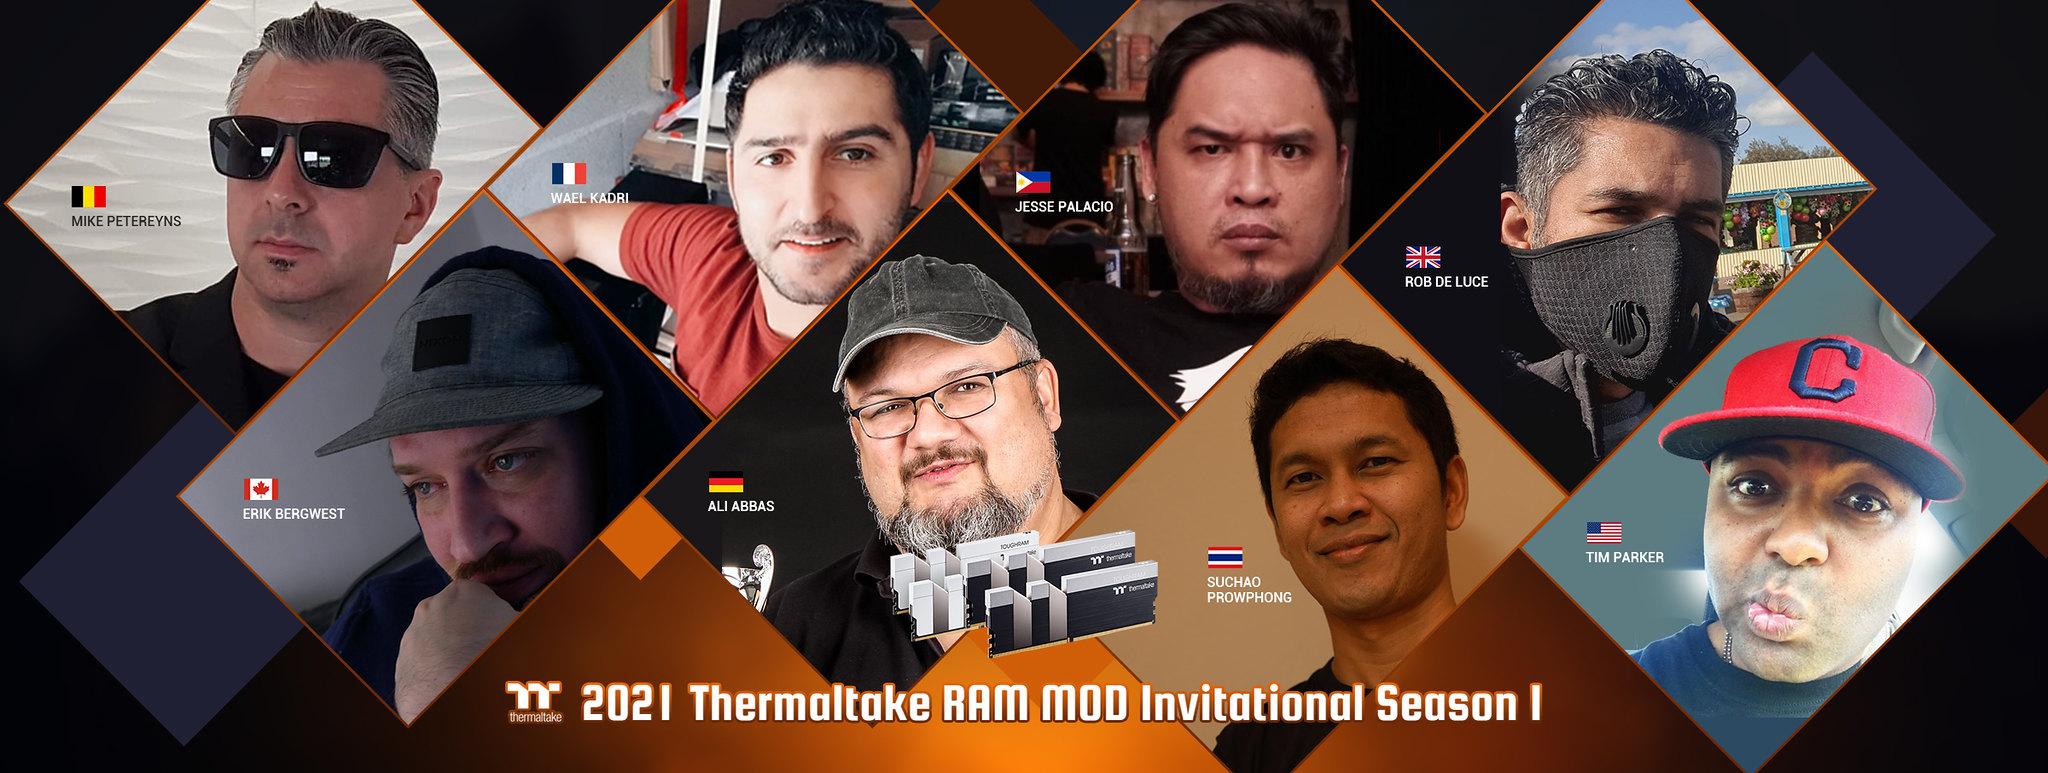 Thermaltake 2021 Season 1 Ram Mod Invitational.